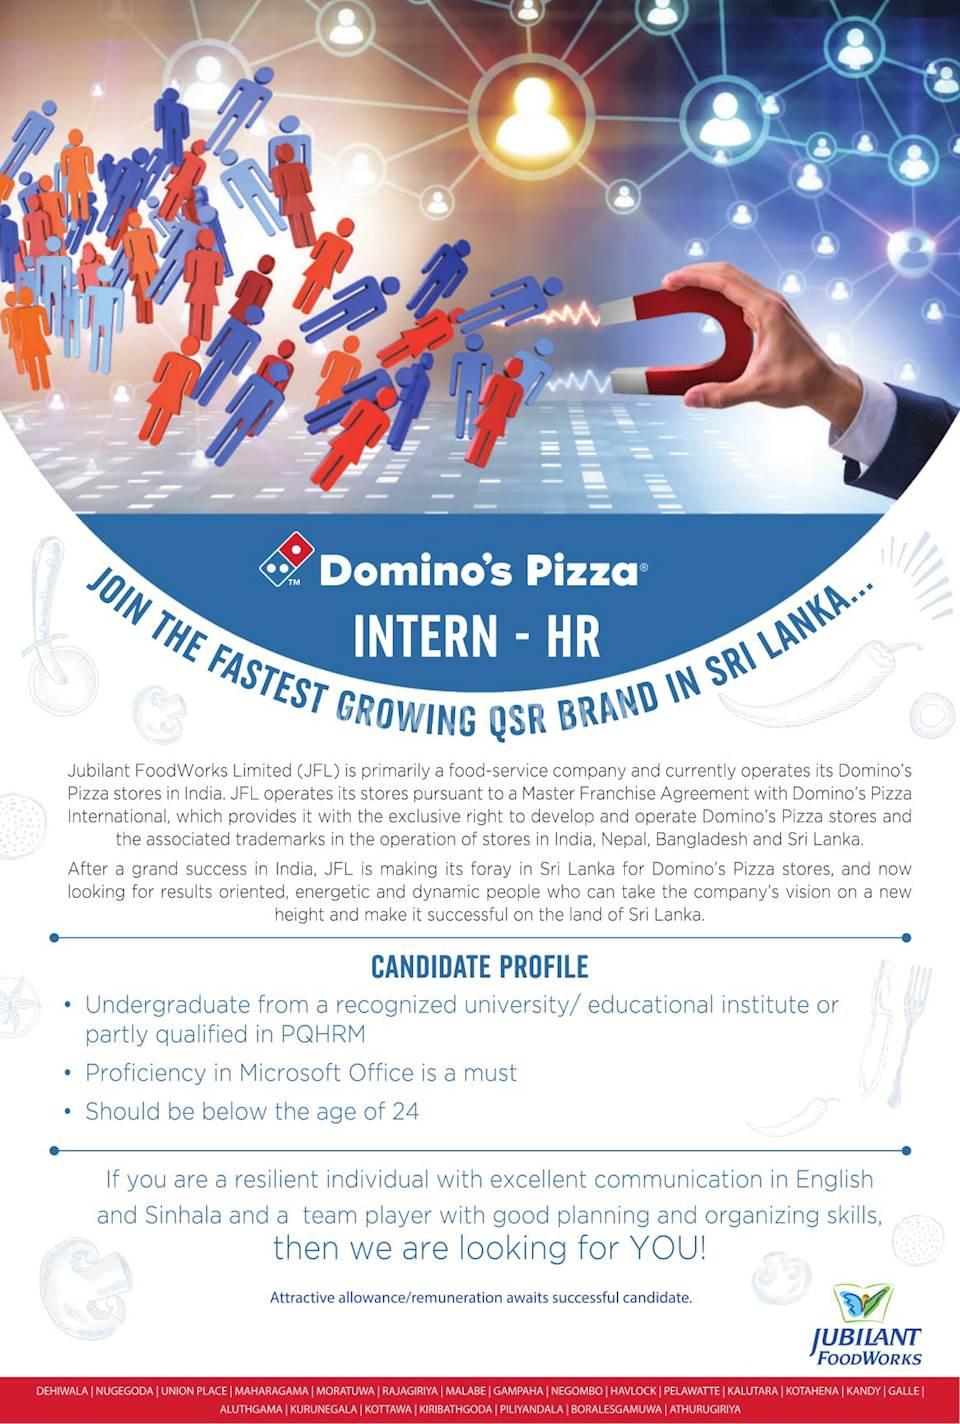 Intern - HR at Domino's Pizza